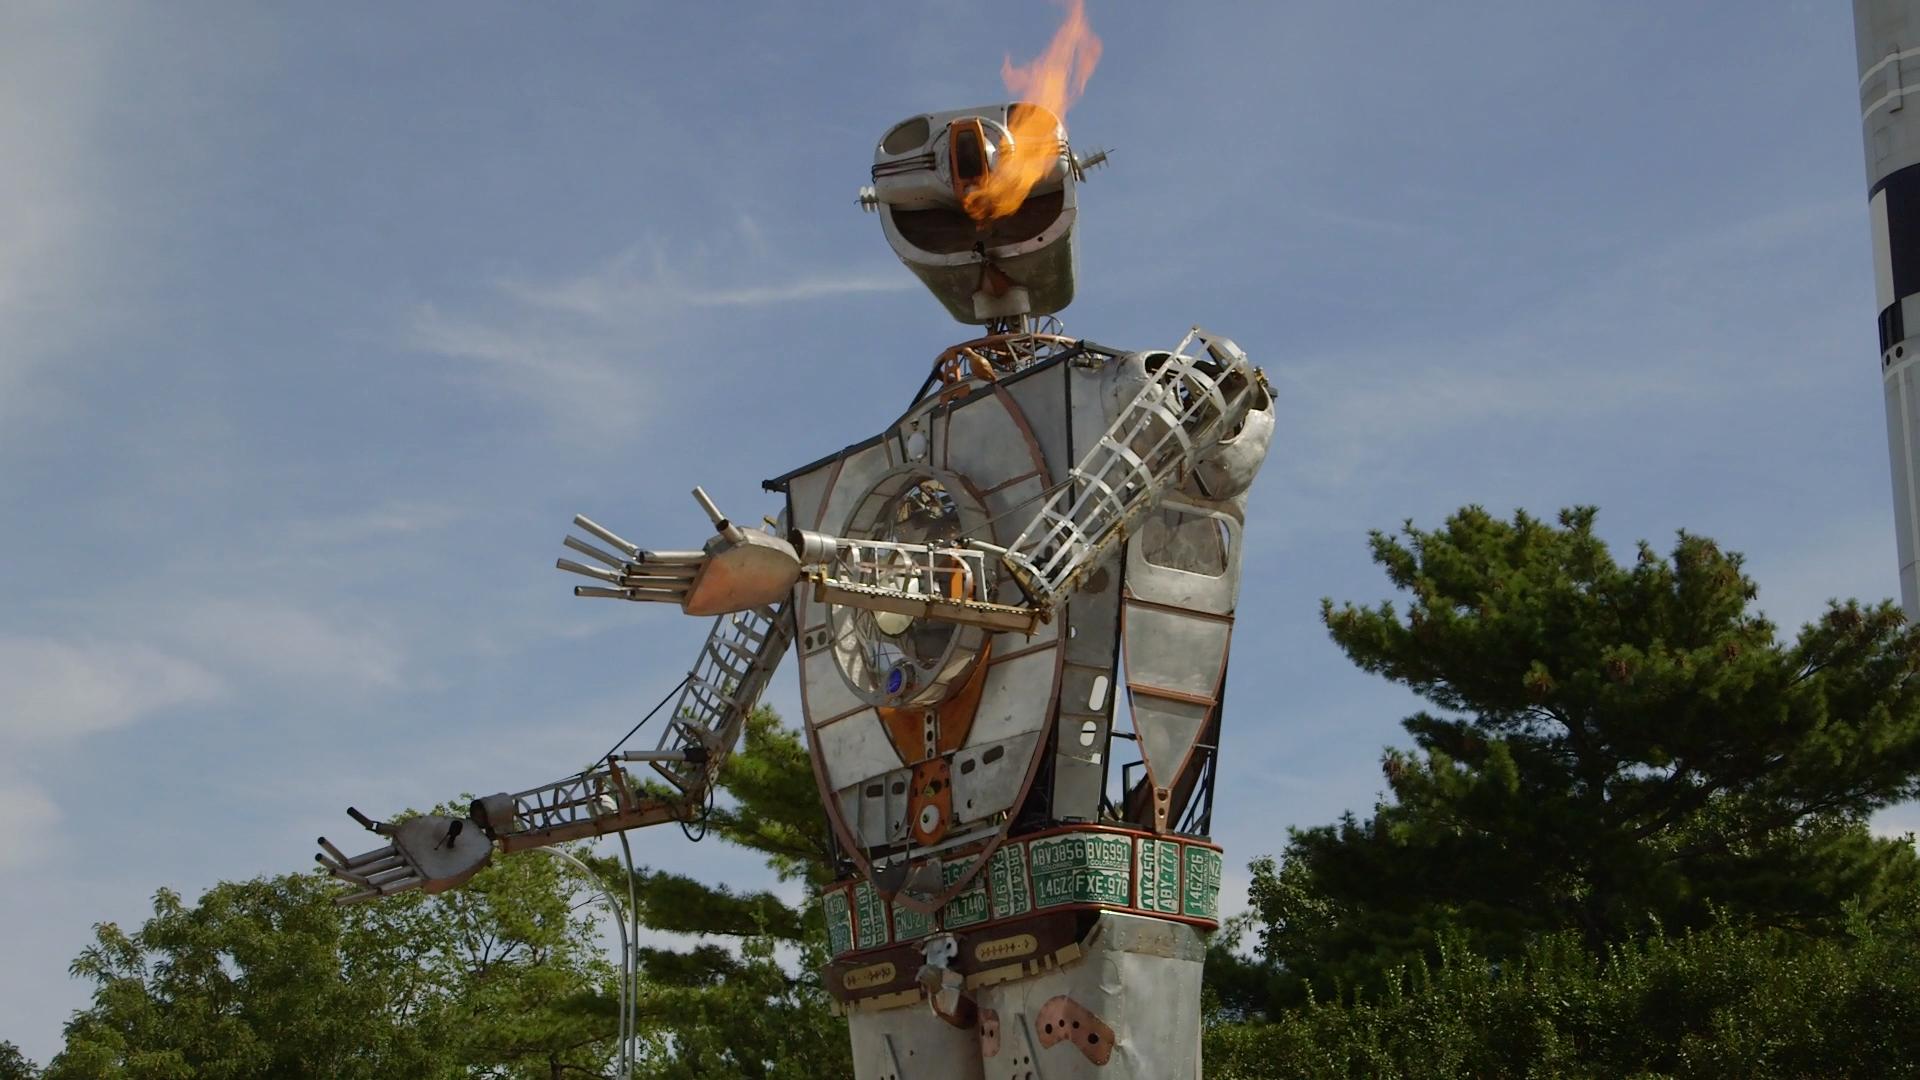 Maker Faire: Go Inside A 30-Foot Fire-Breathing Robot